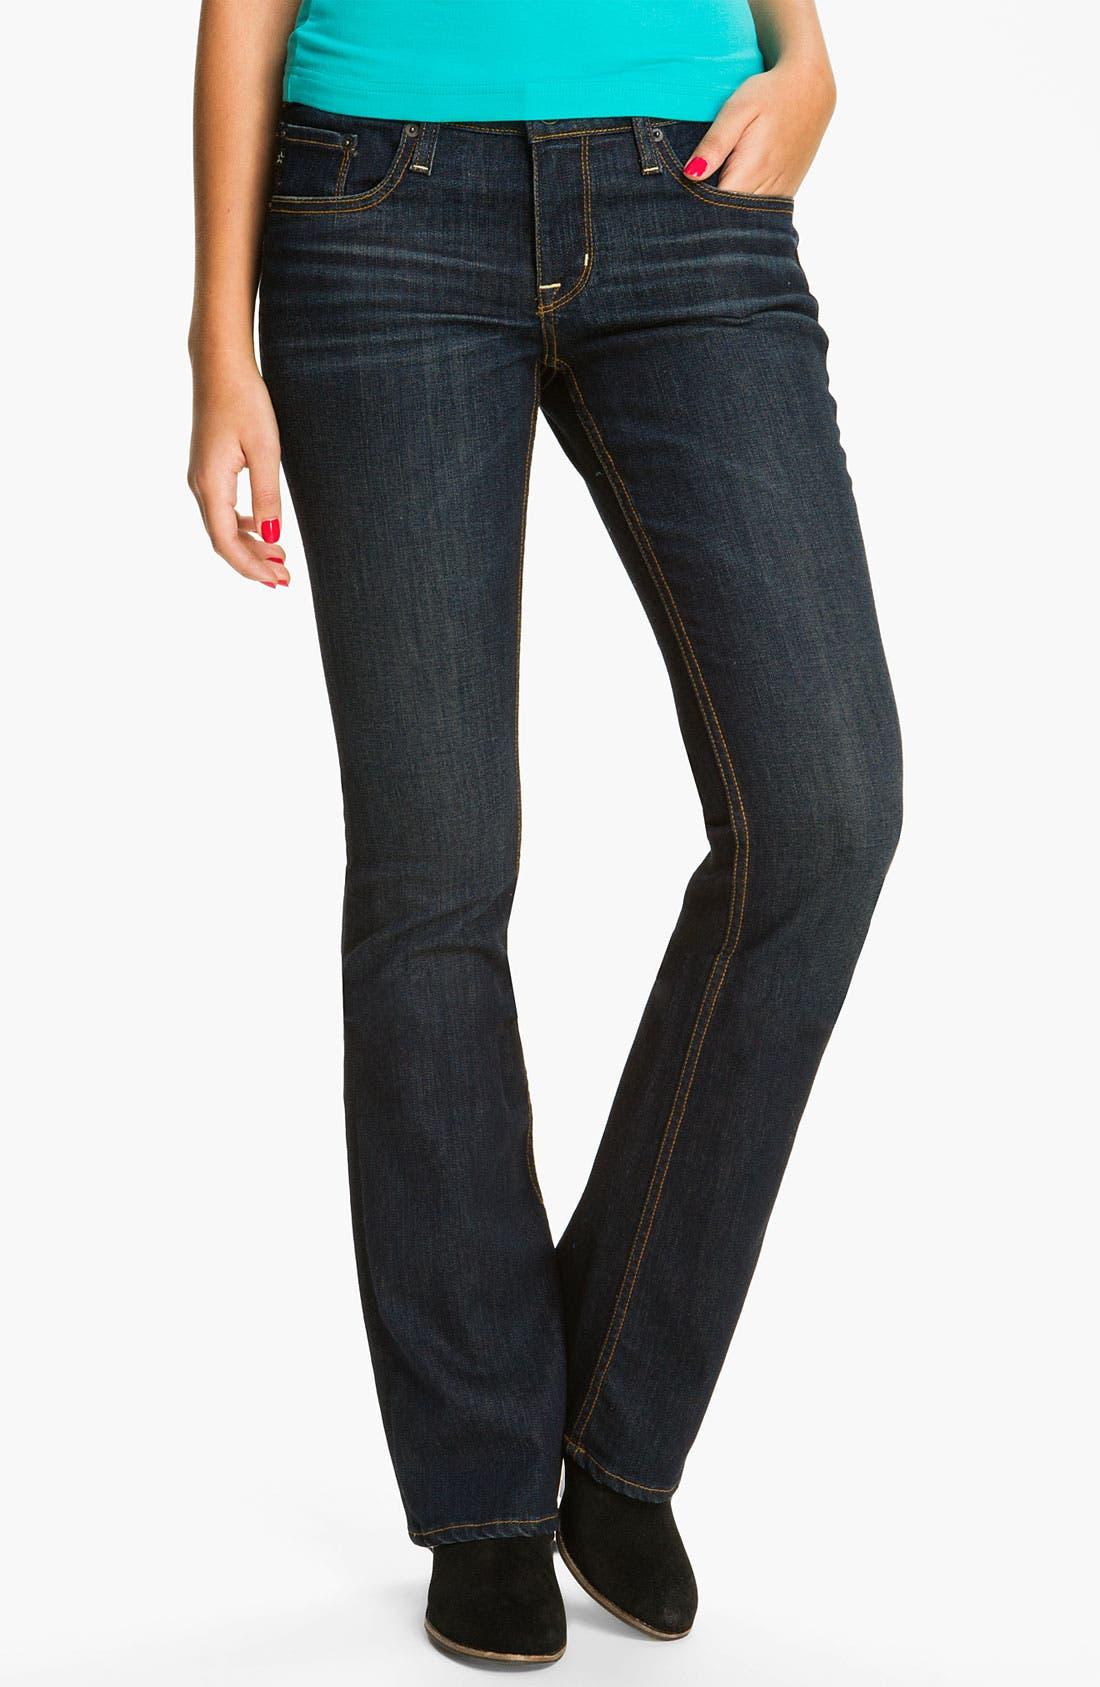 Alternate Image 1 Selected - Big Star 'Hazel' Slim Bootcut Jeans (Three Year Dust) (Juniors)